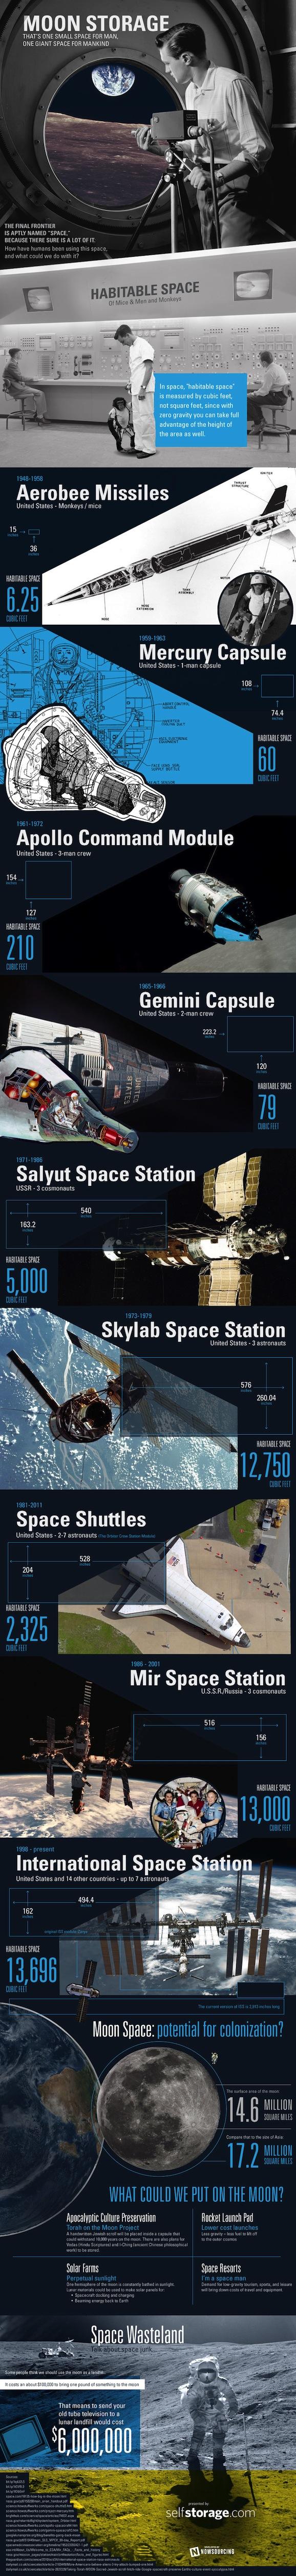 self-storage.com-moon-storage